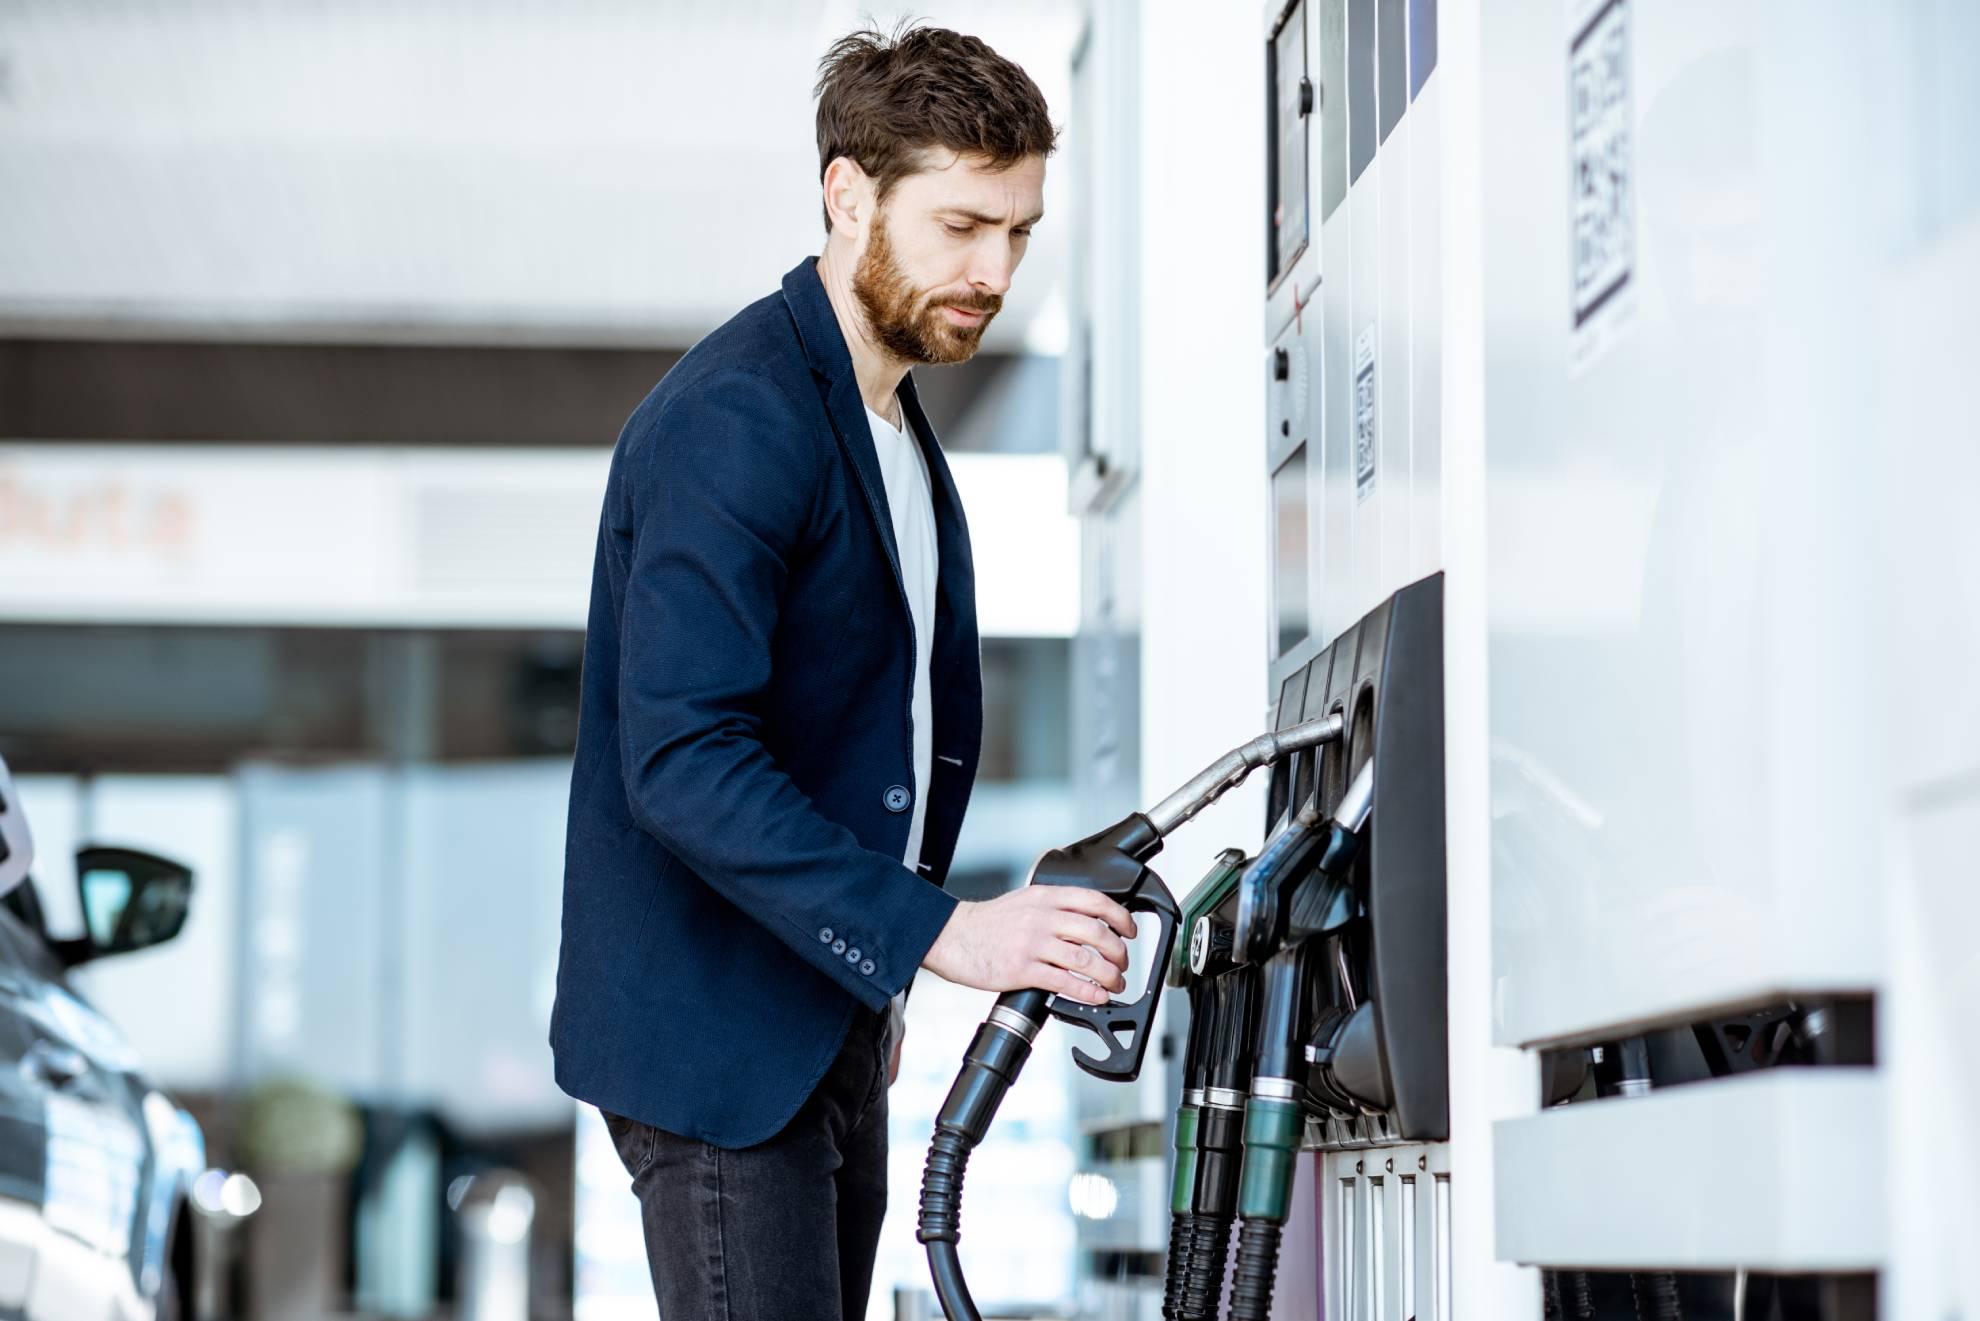 businessman-refueling-car-at-the-station-LTPNZ55 (1)-min